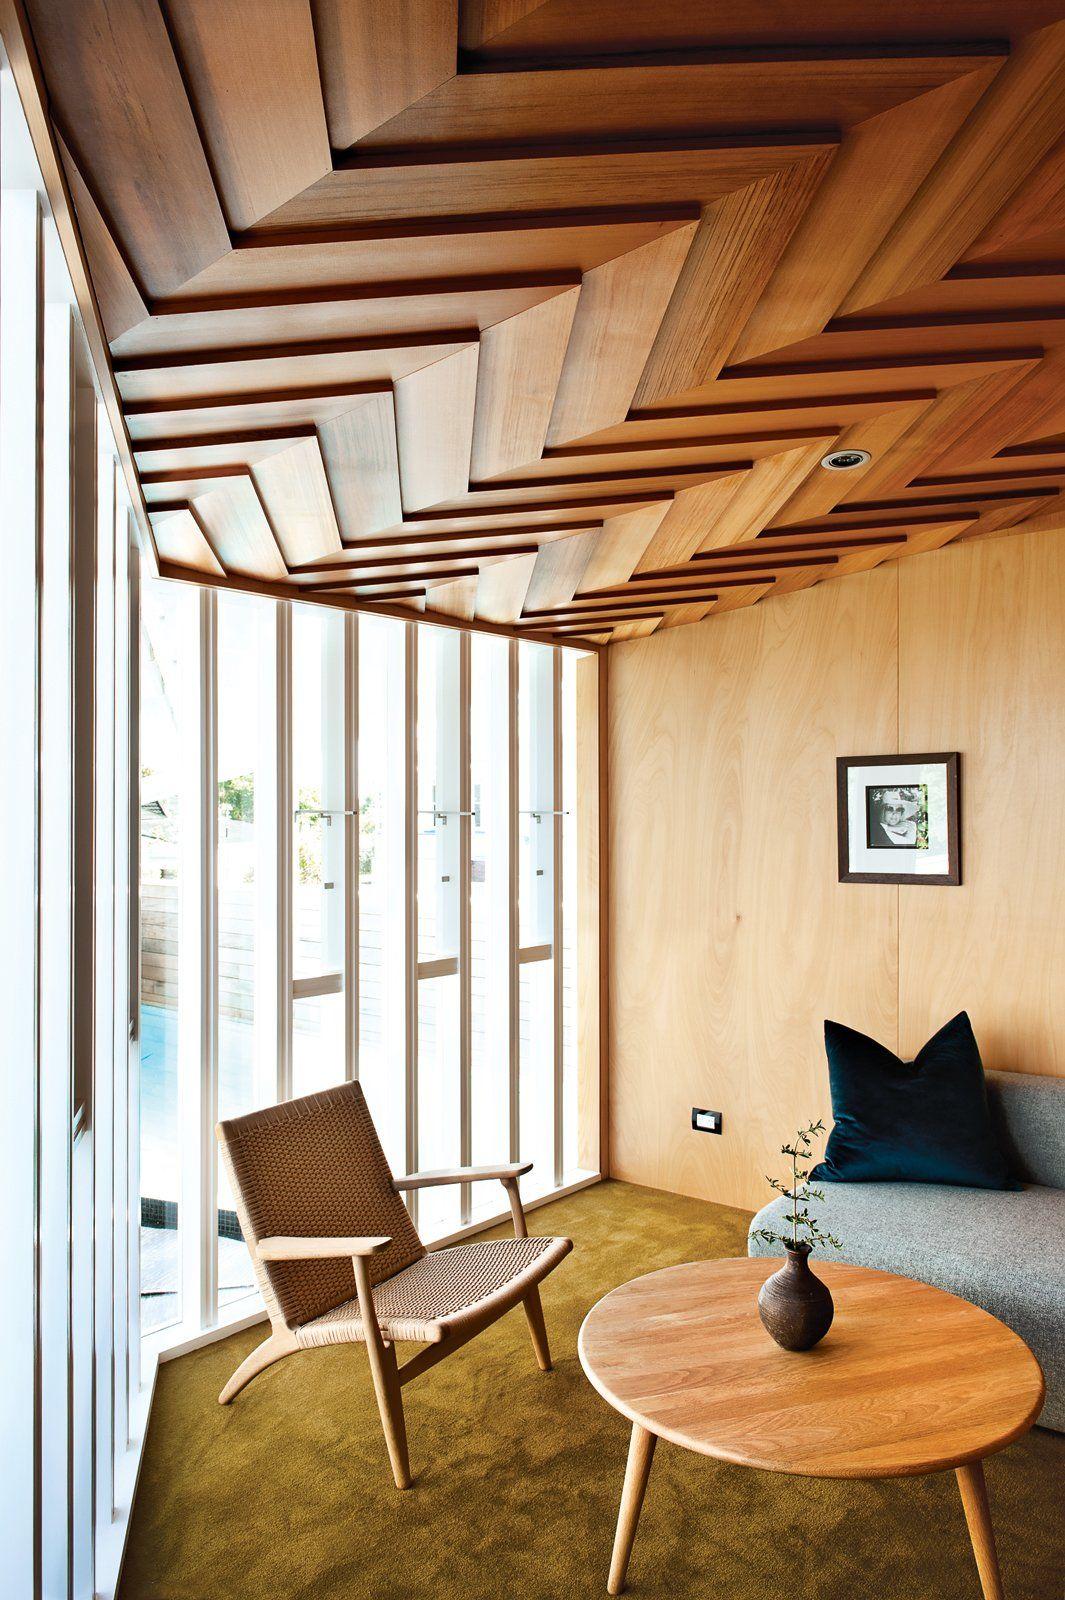 wooden-ceiling-design +70 Unique Ceiling Design Ideas for Your Living Room